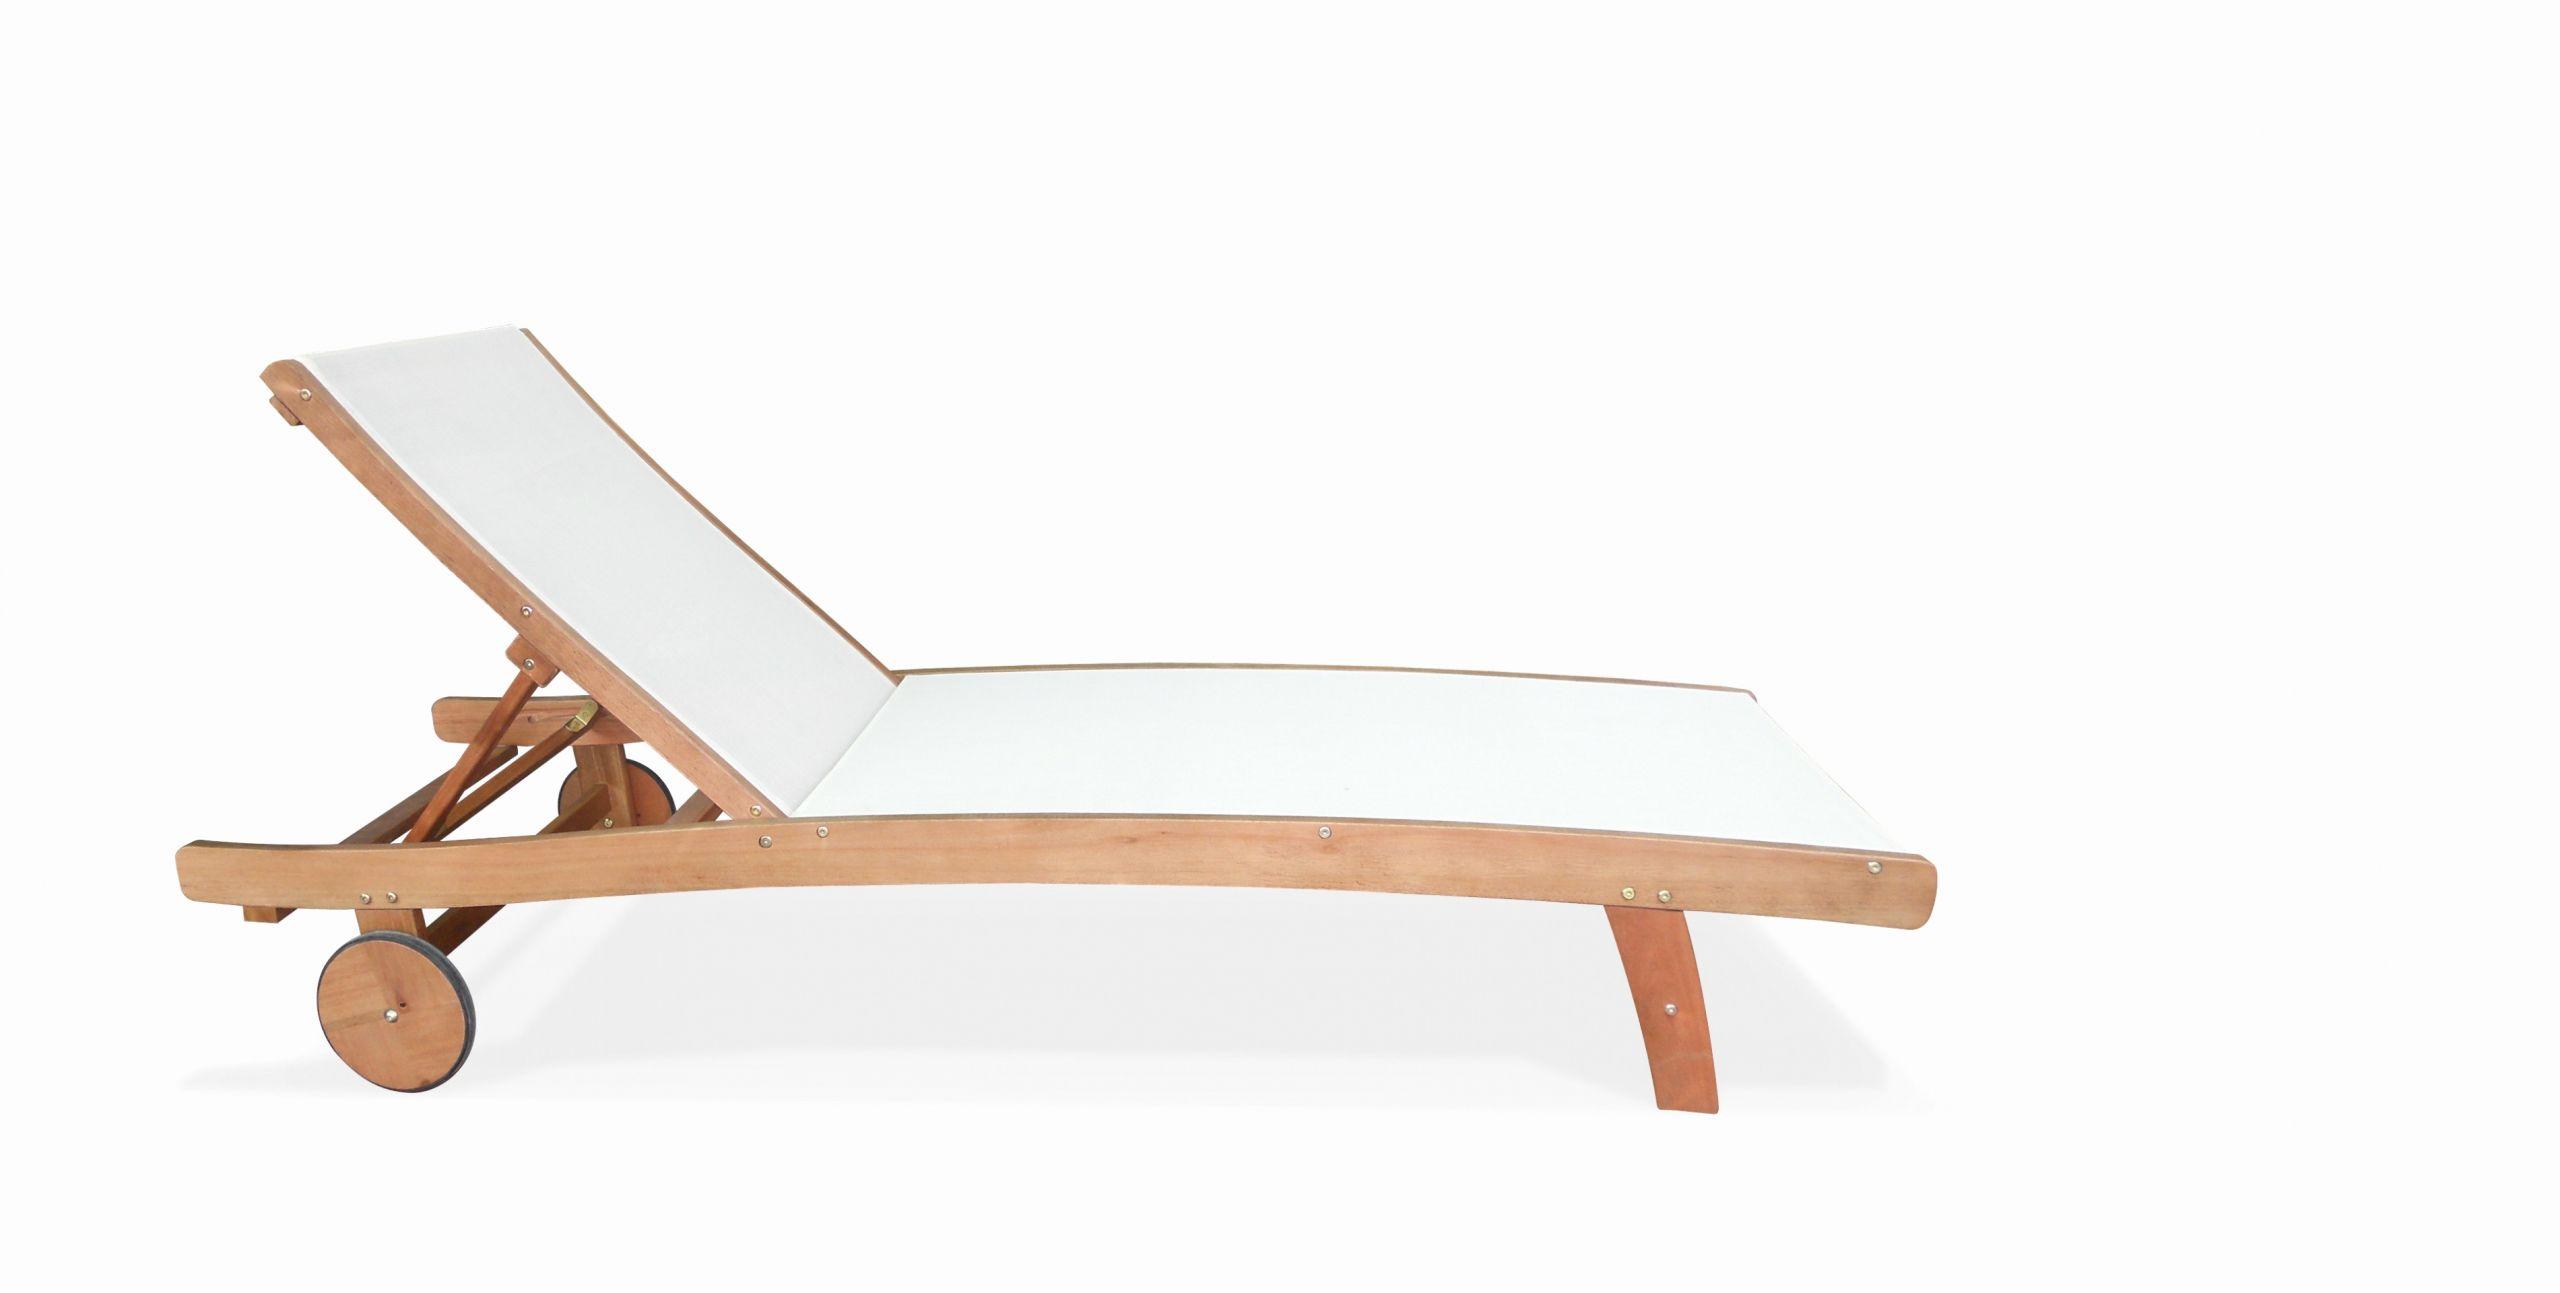 chaise jardin teck luxe transat jardin bois fresh chaises longues jardin chaise vidaxl 0d of chaise jardin teck